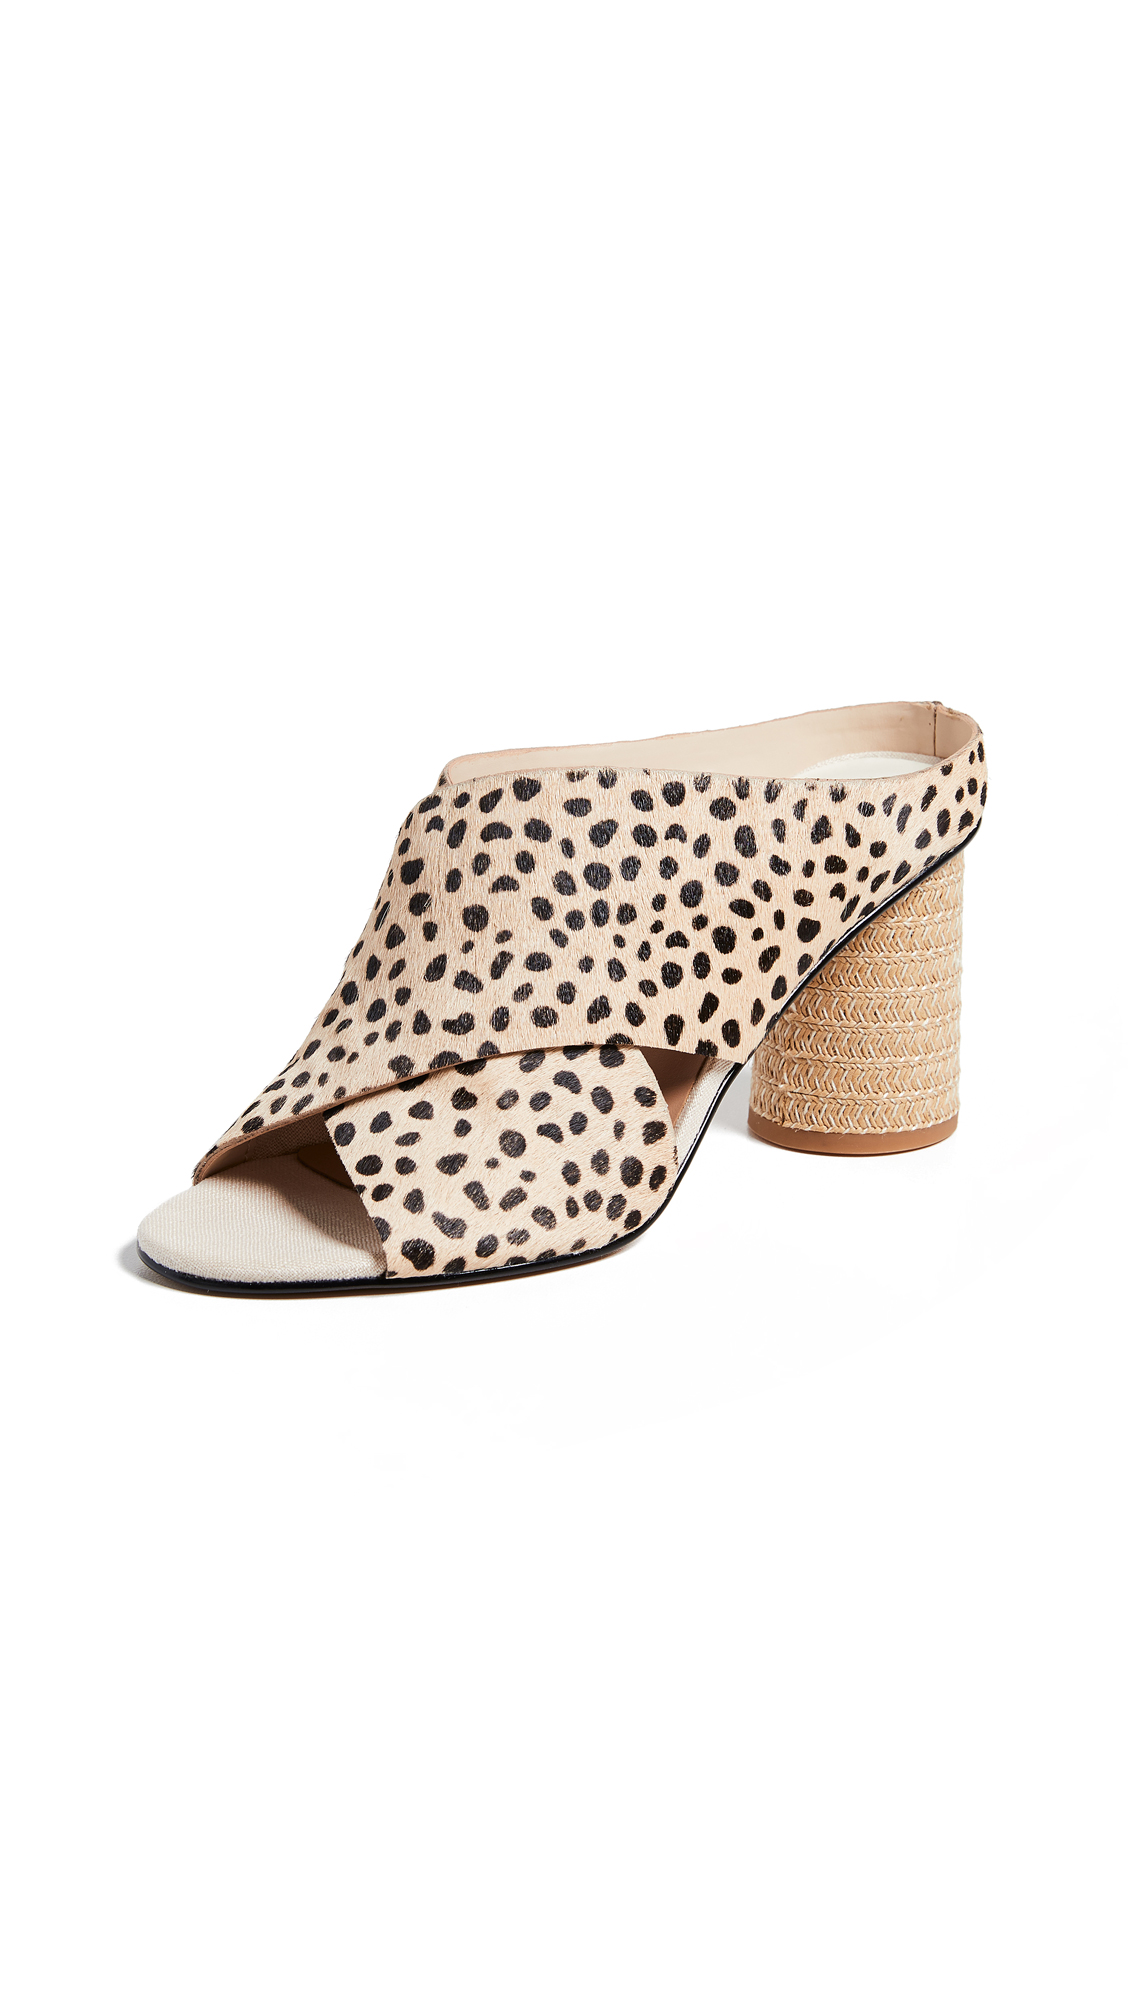 Dolce Vita Javi Block Heel Sandals - Leopard